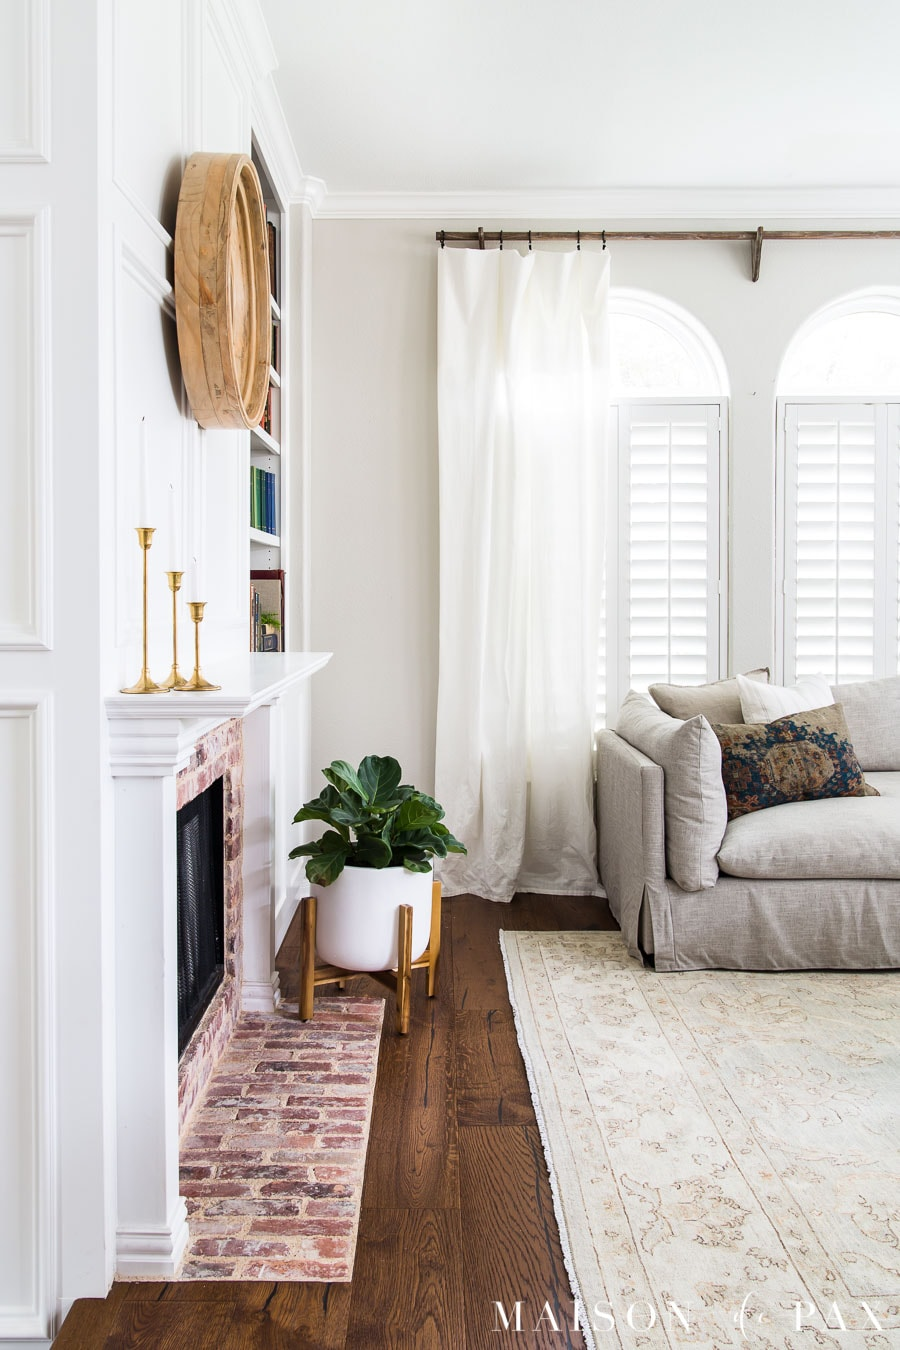 decorate a neutral space with texture: brick, area rugs, wood, linen   Maison de Pax